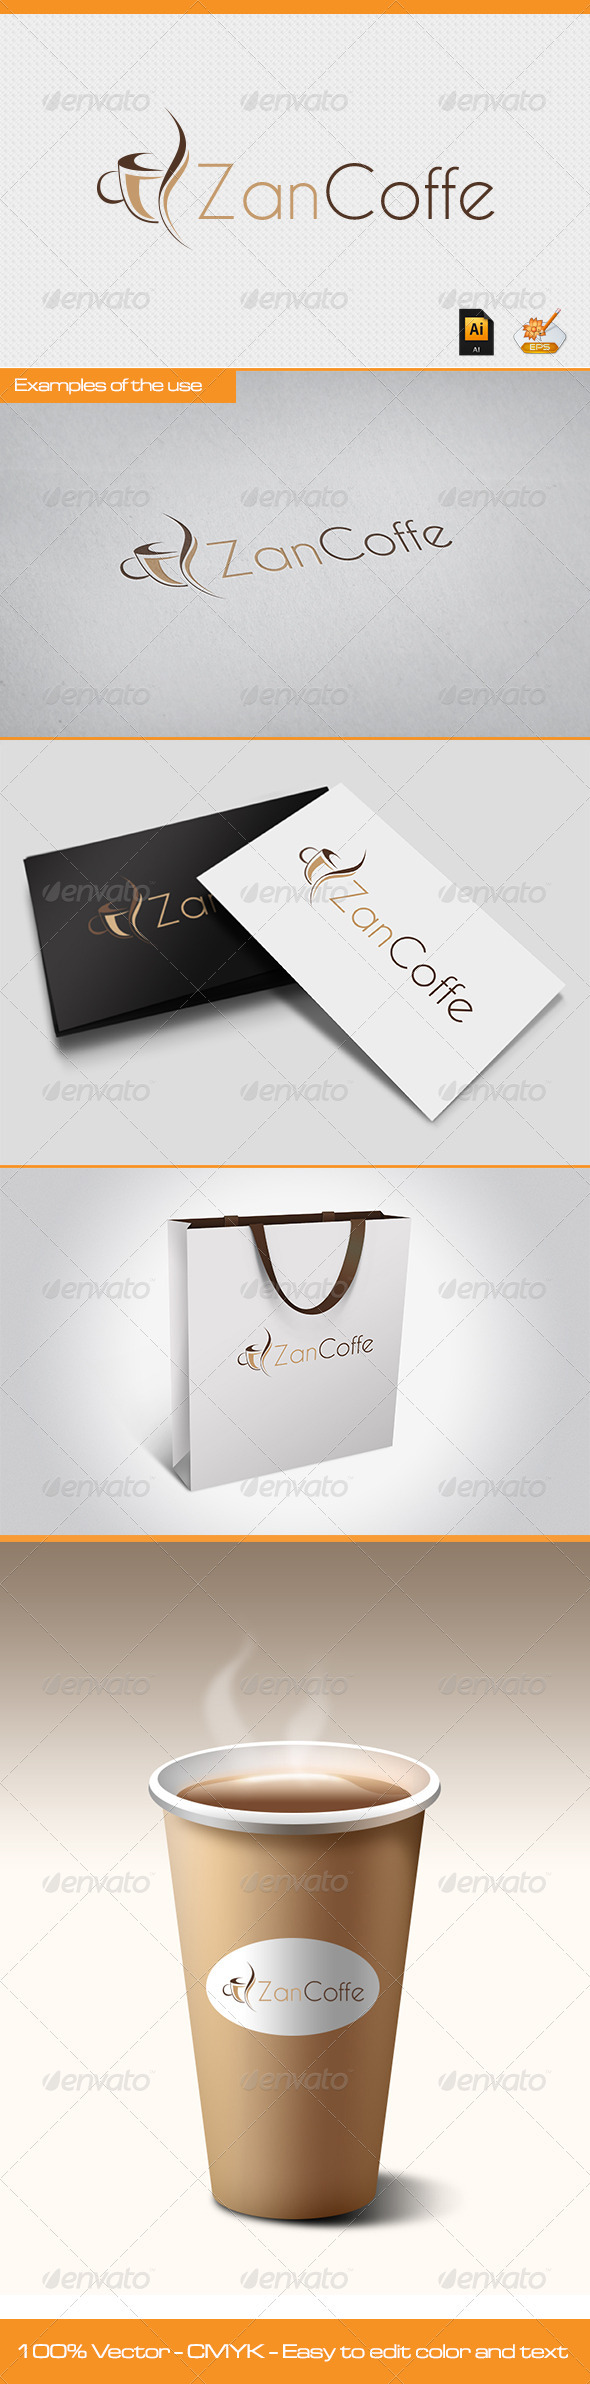 Zan Coffe Logo Template - Symbols Logo Templates